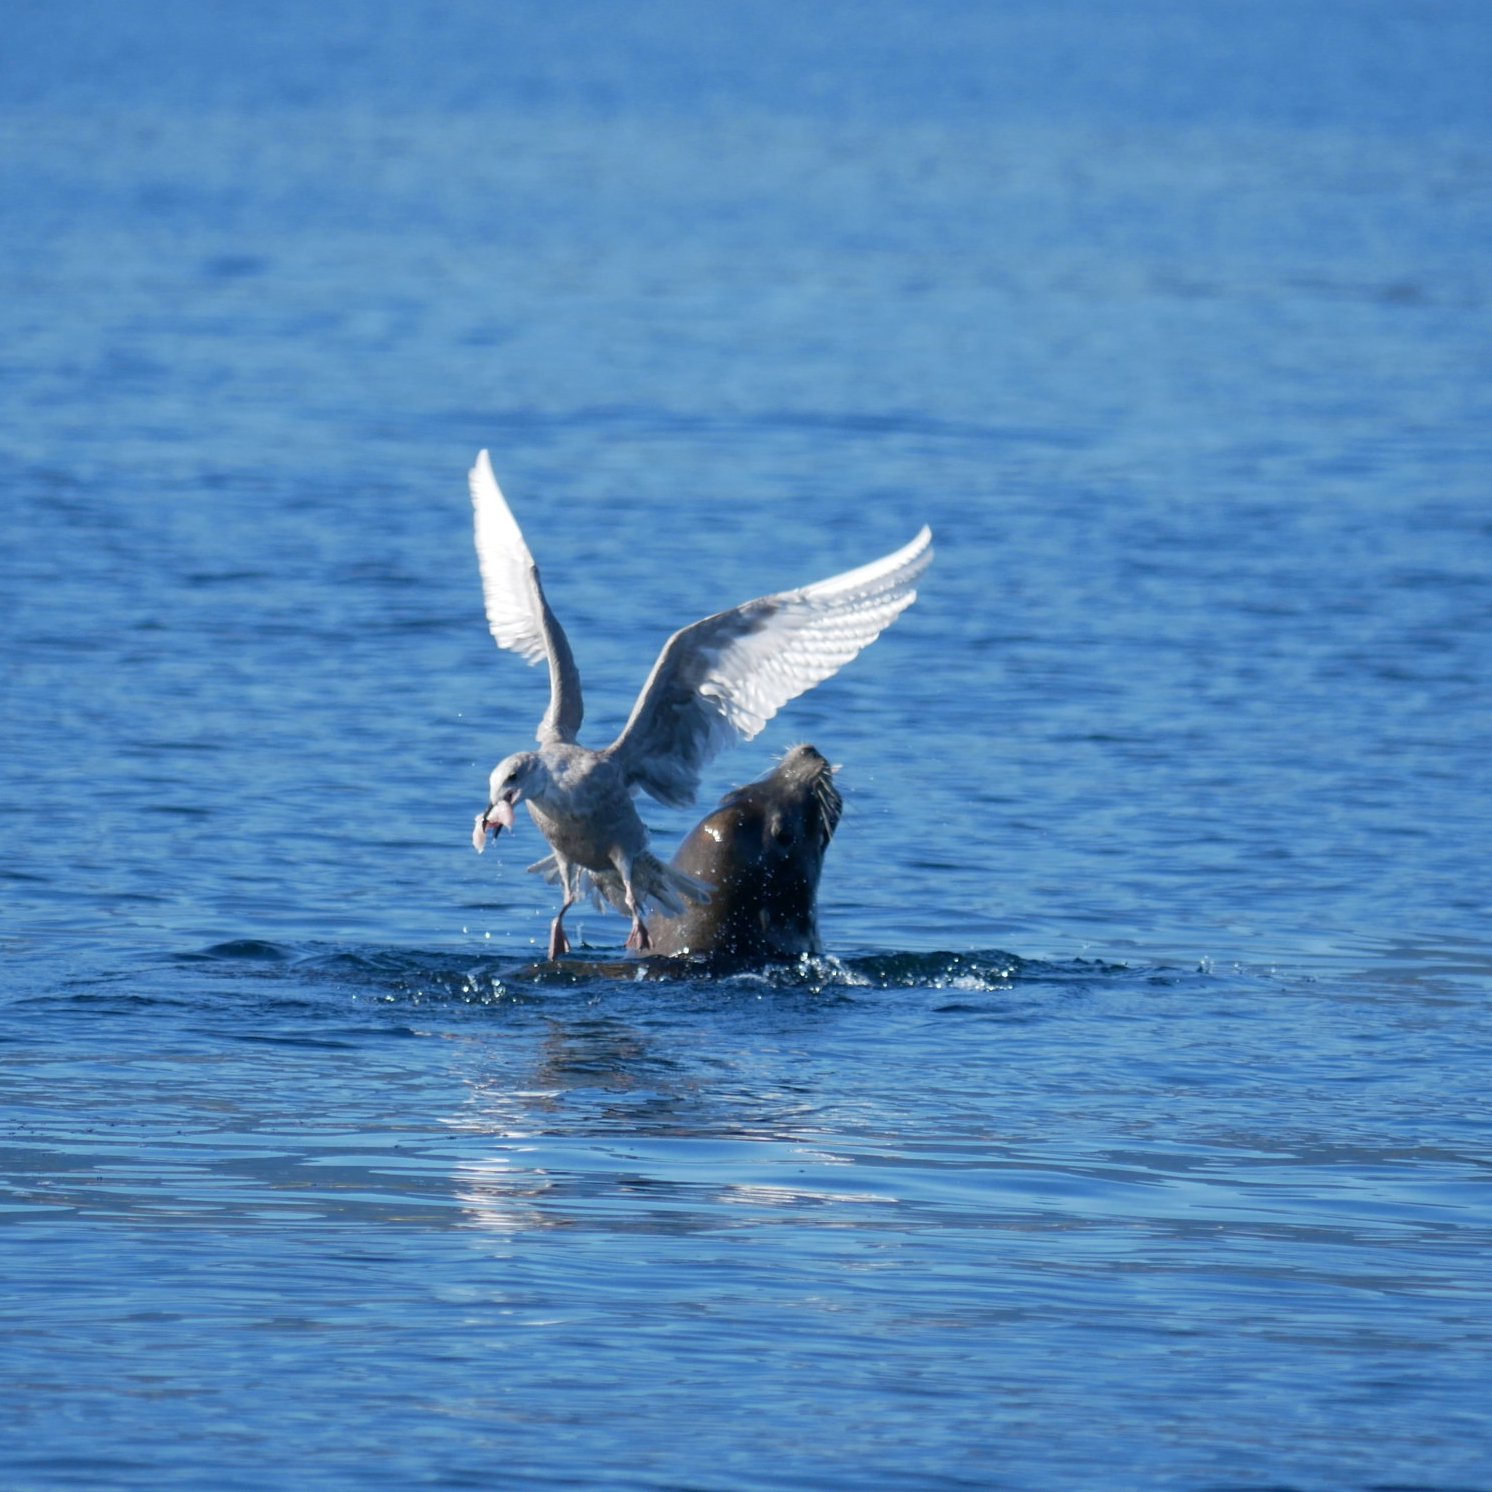 seagull stole some grub!